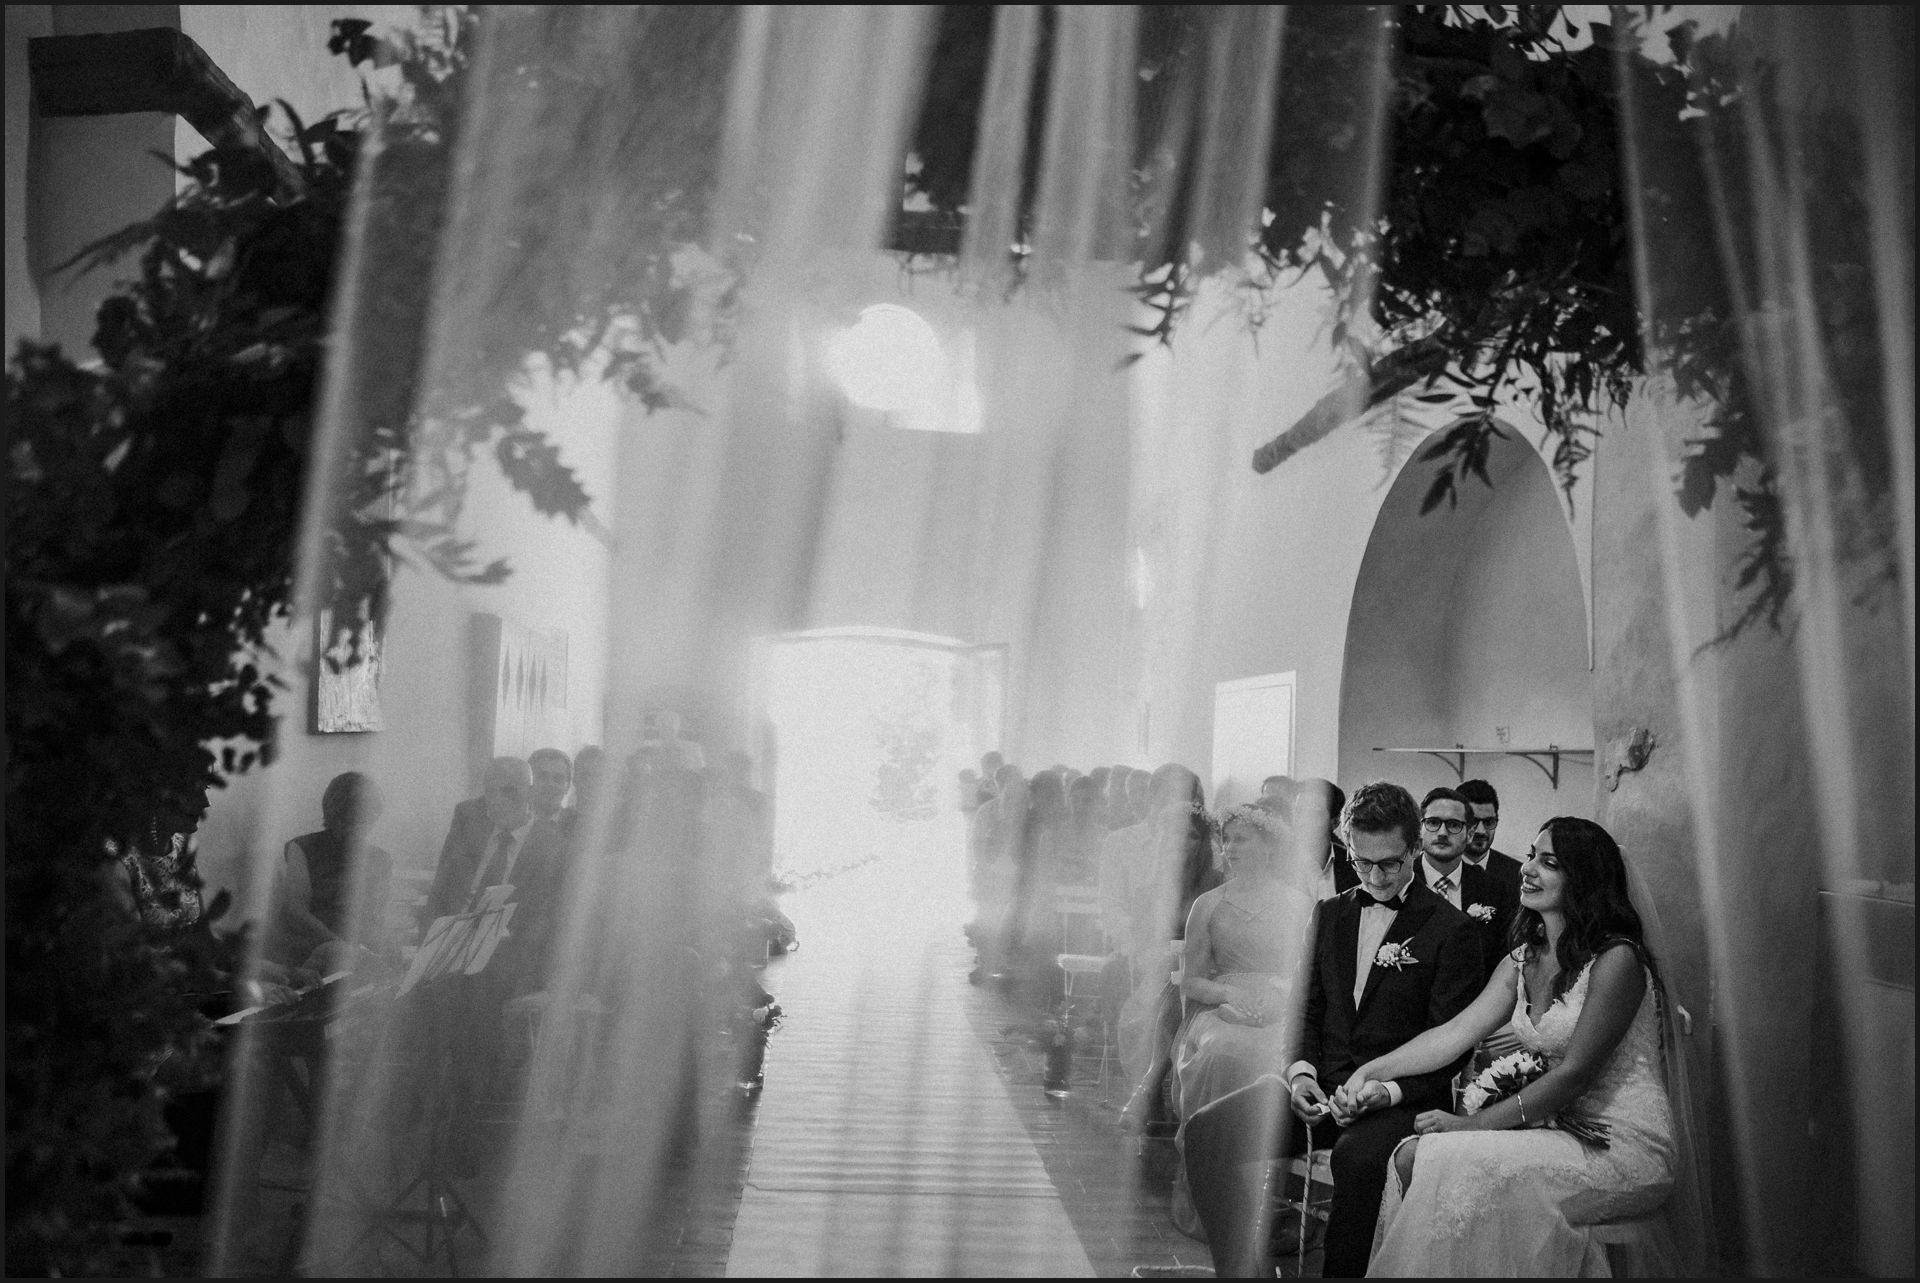 wedding, symbolic ceremony, wedding, umbria, nikis resort, black and white, veil